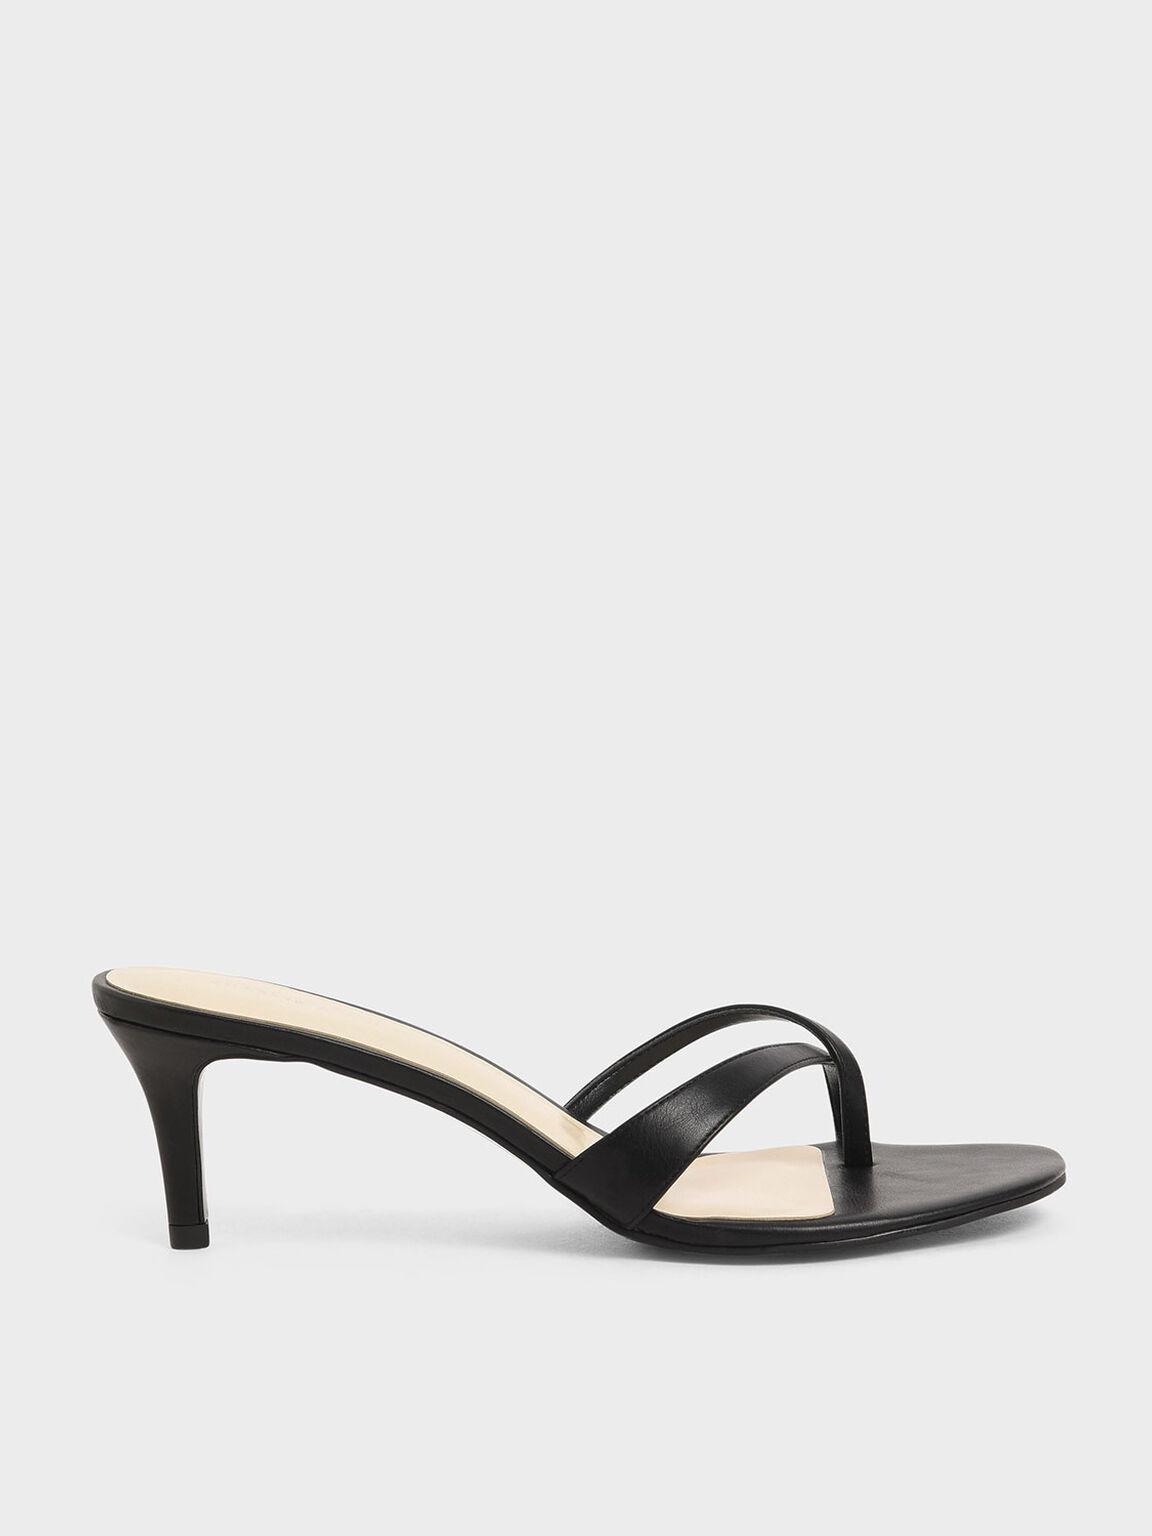 Toe Strap Heeled Sandals, Black, hi-res